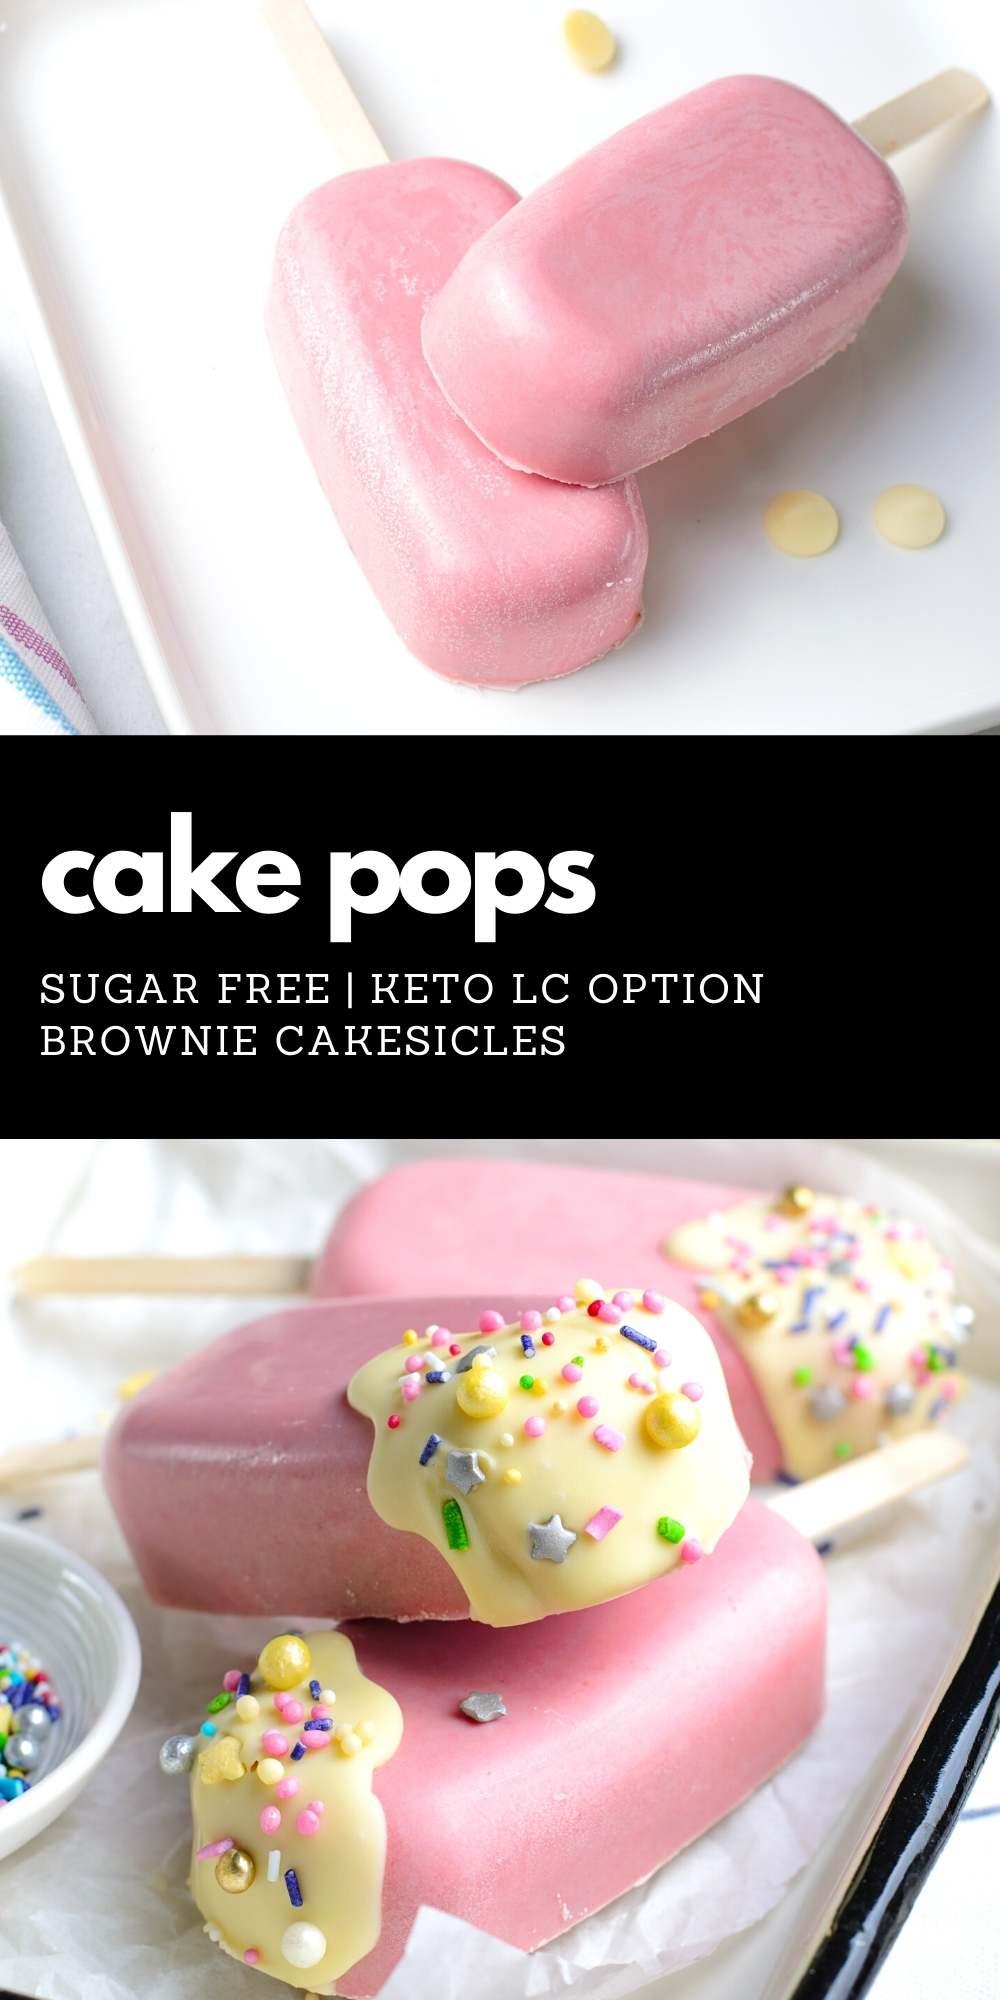 Sugar Free Cake Pops